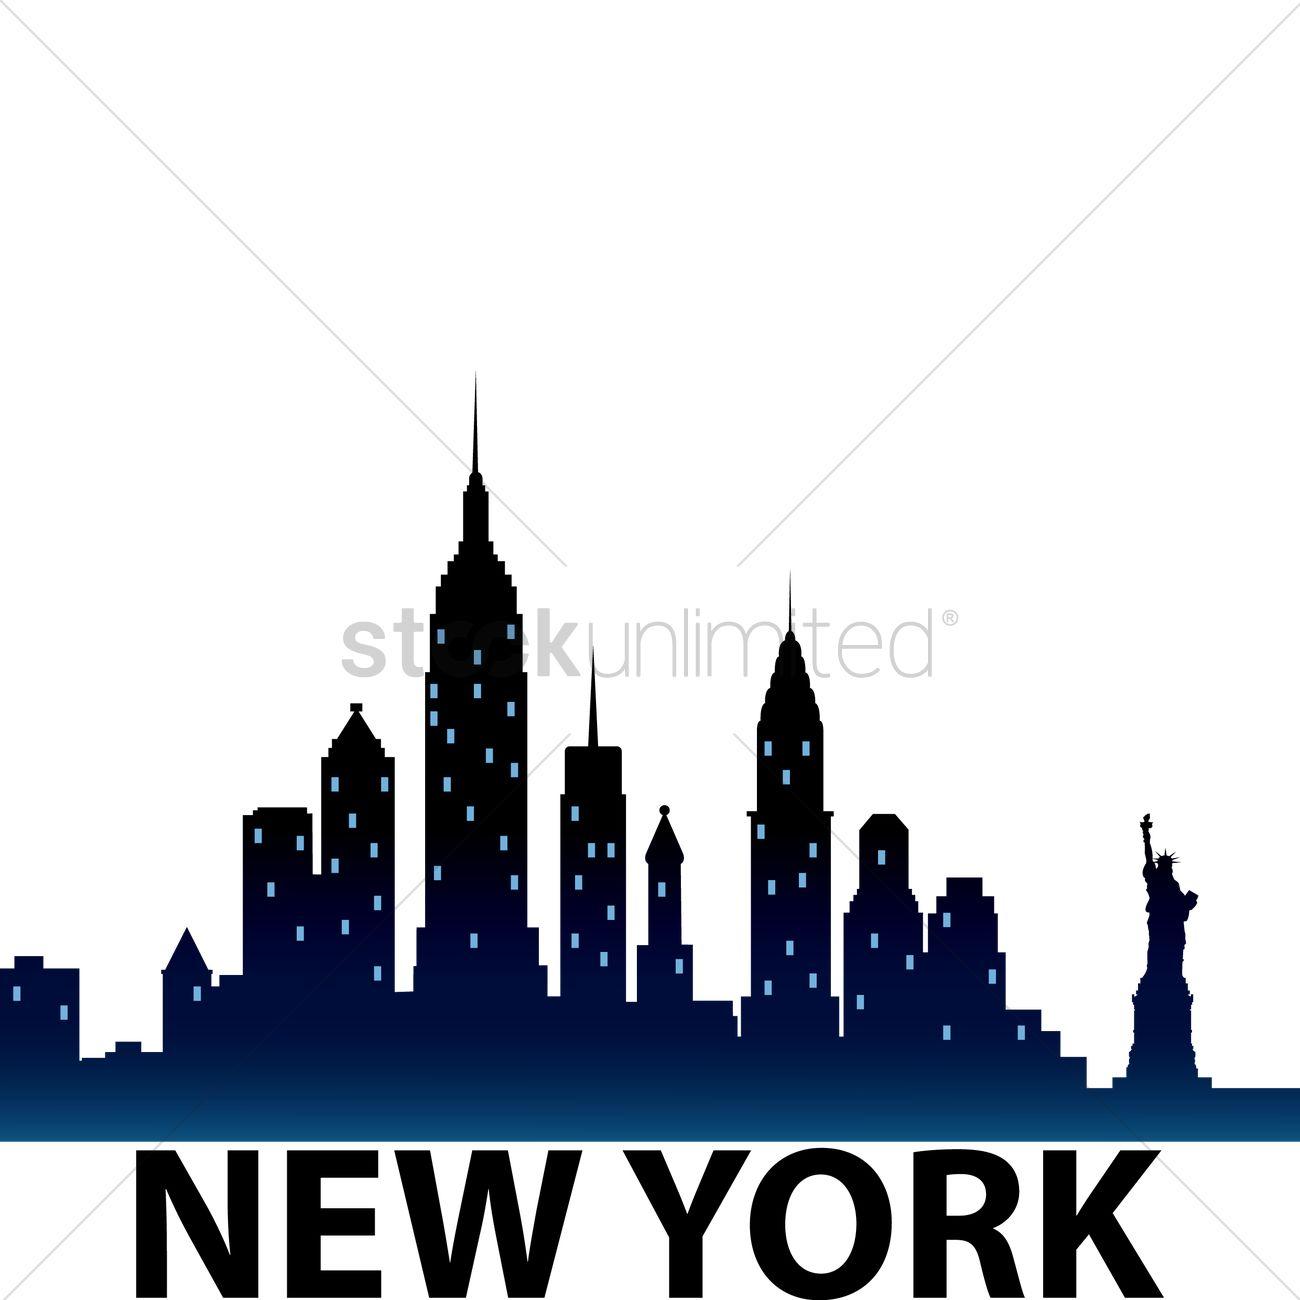 1300x1300 New York City Skyline Silhouette Vector Image